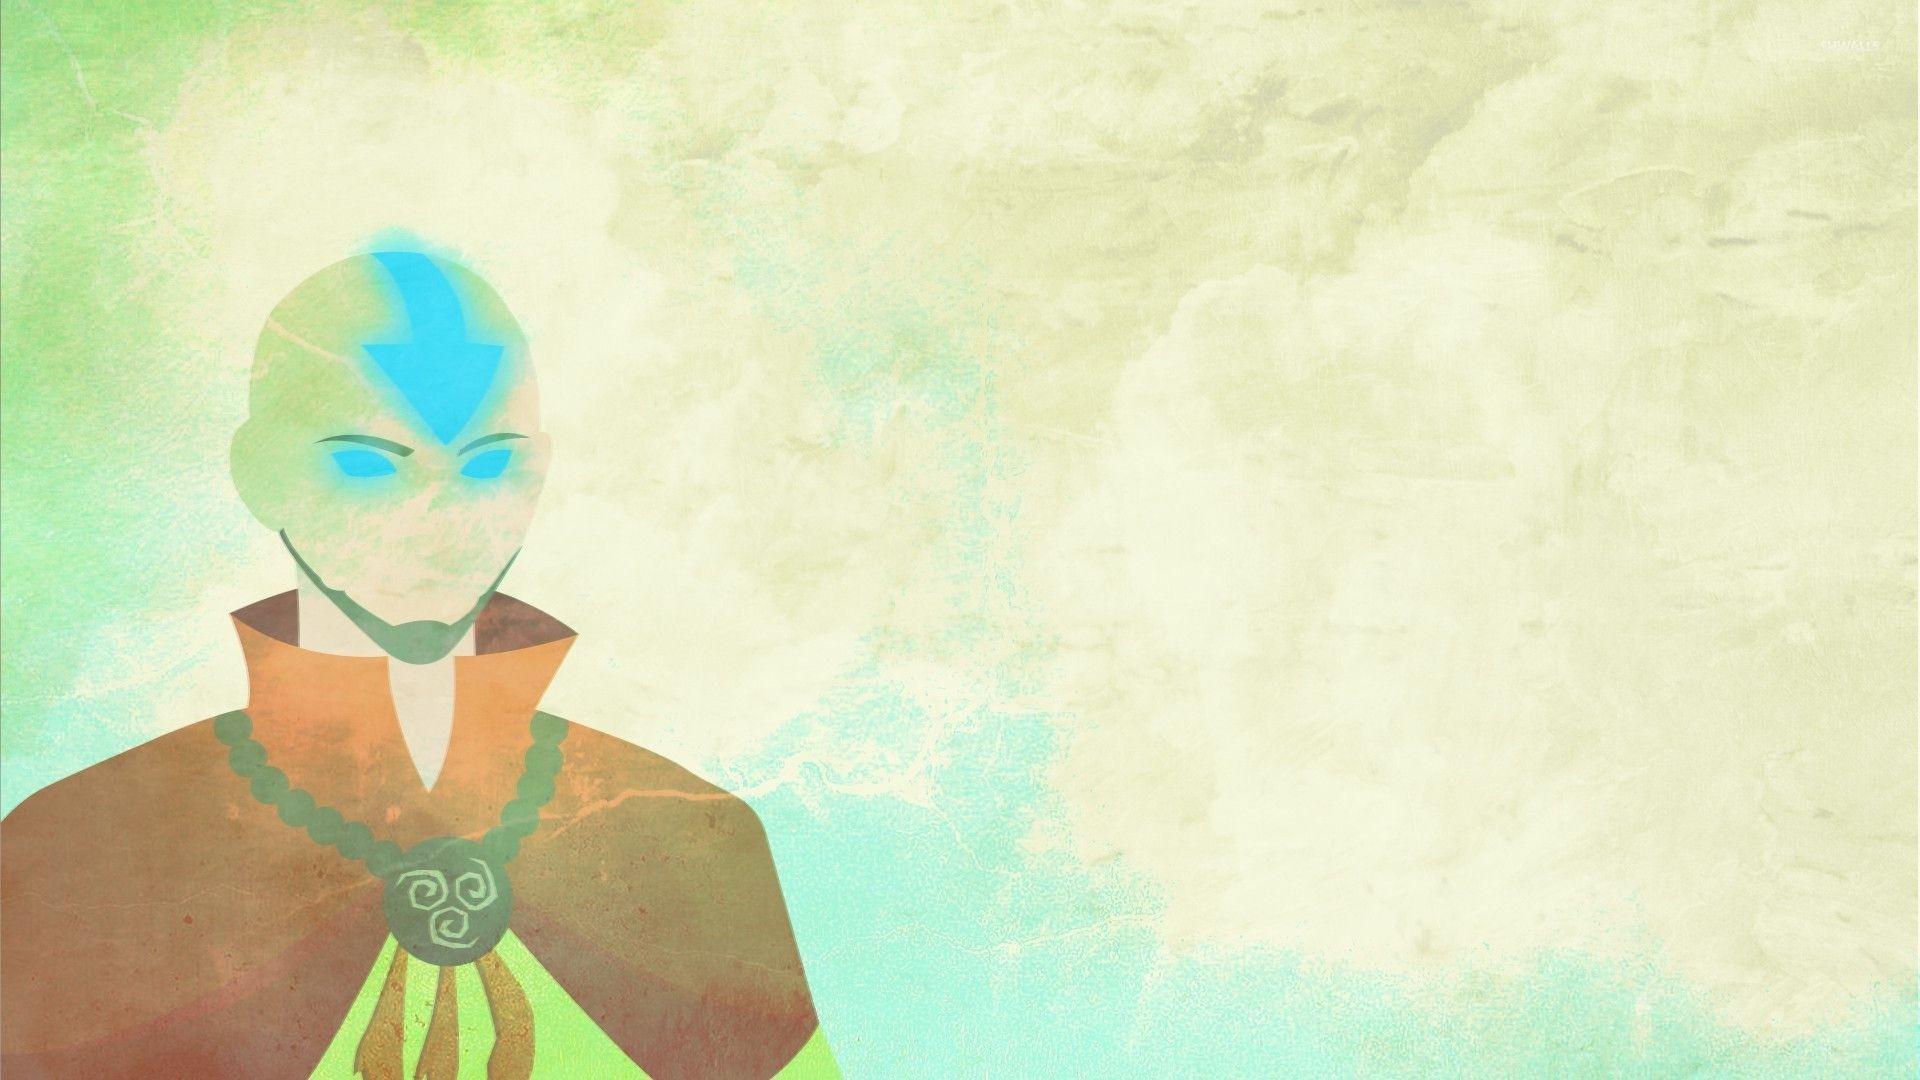 Avatar The Last Airbender PC Wallpaper